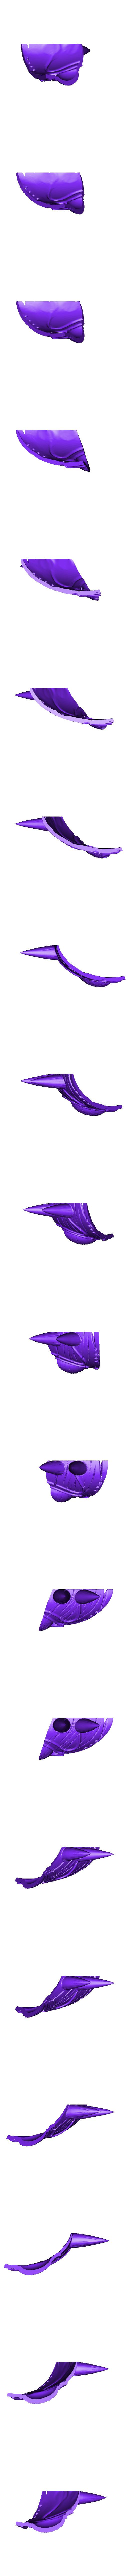 AI3M_R-bottom.stl Download free STL file Wall Mount for Majora's Mask (full size) • 3D printer model, 3DPrintDogs